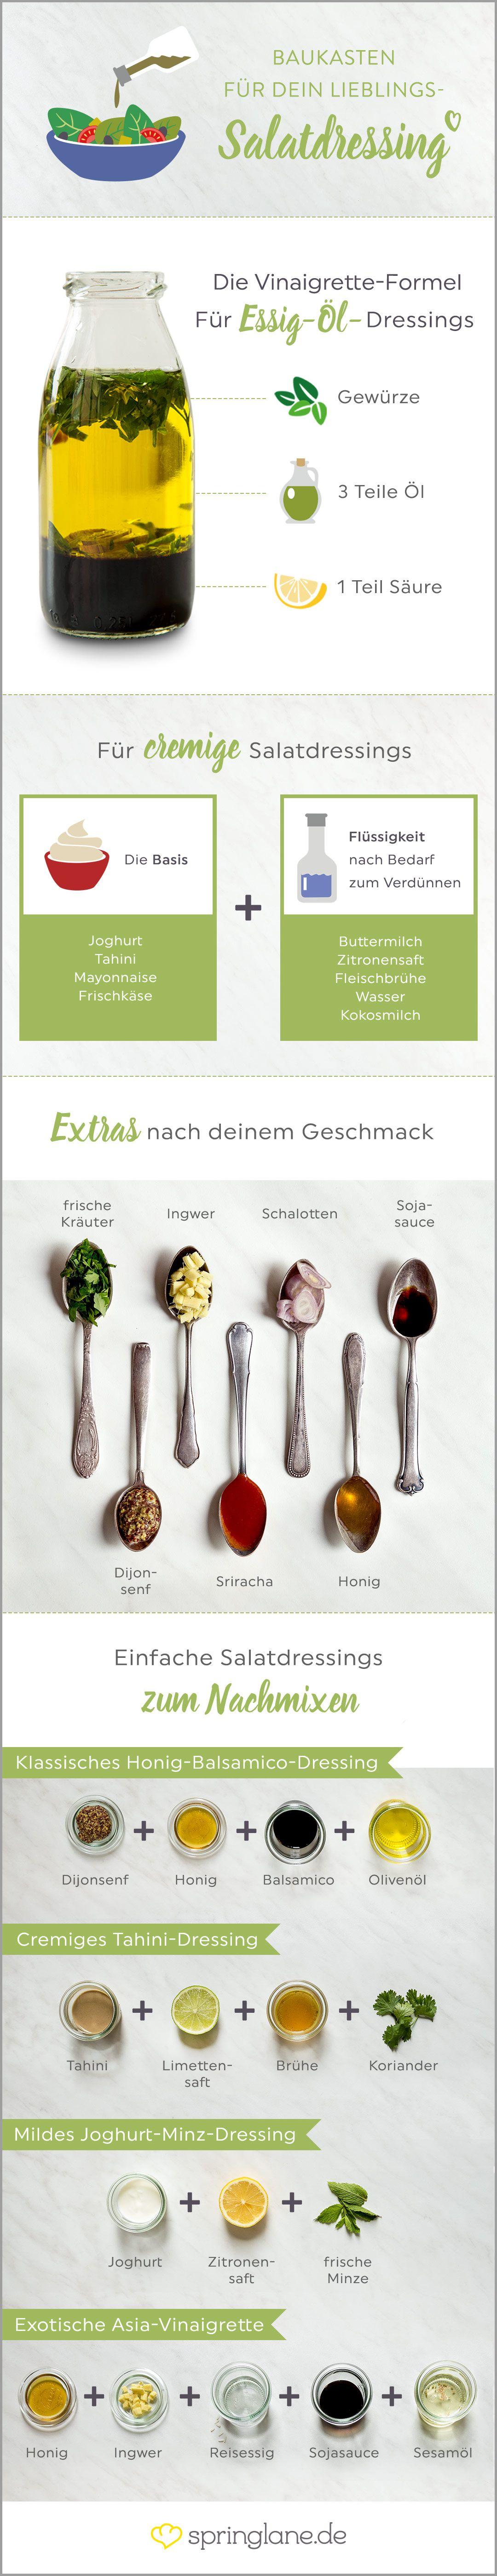 Salat vinaigrette auf vorrat